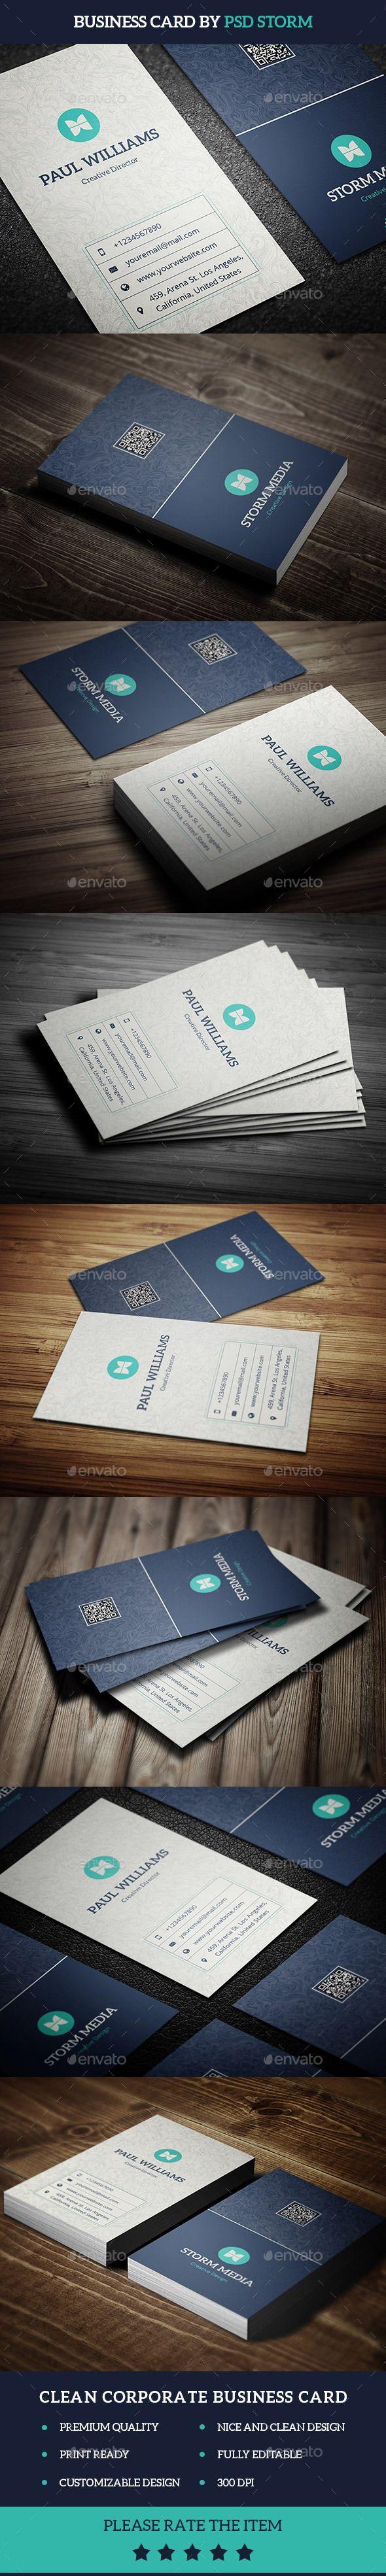 39 best business cards inspiration images on pinterest